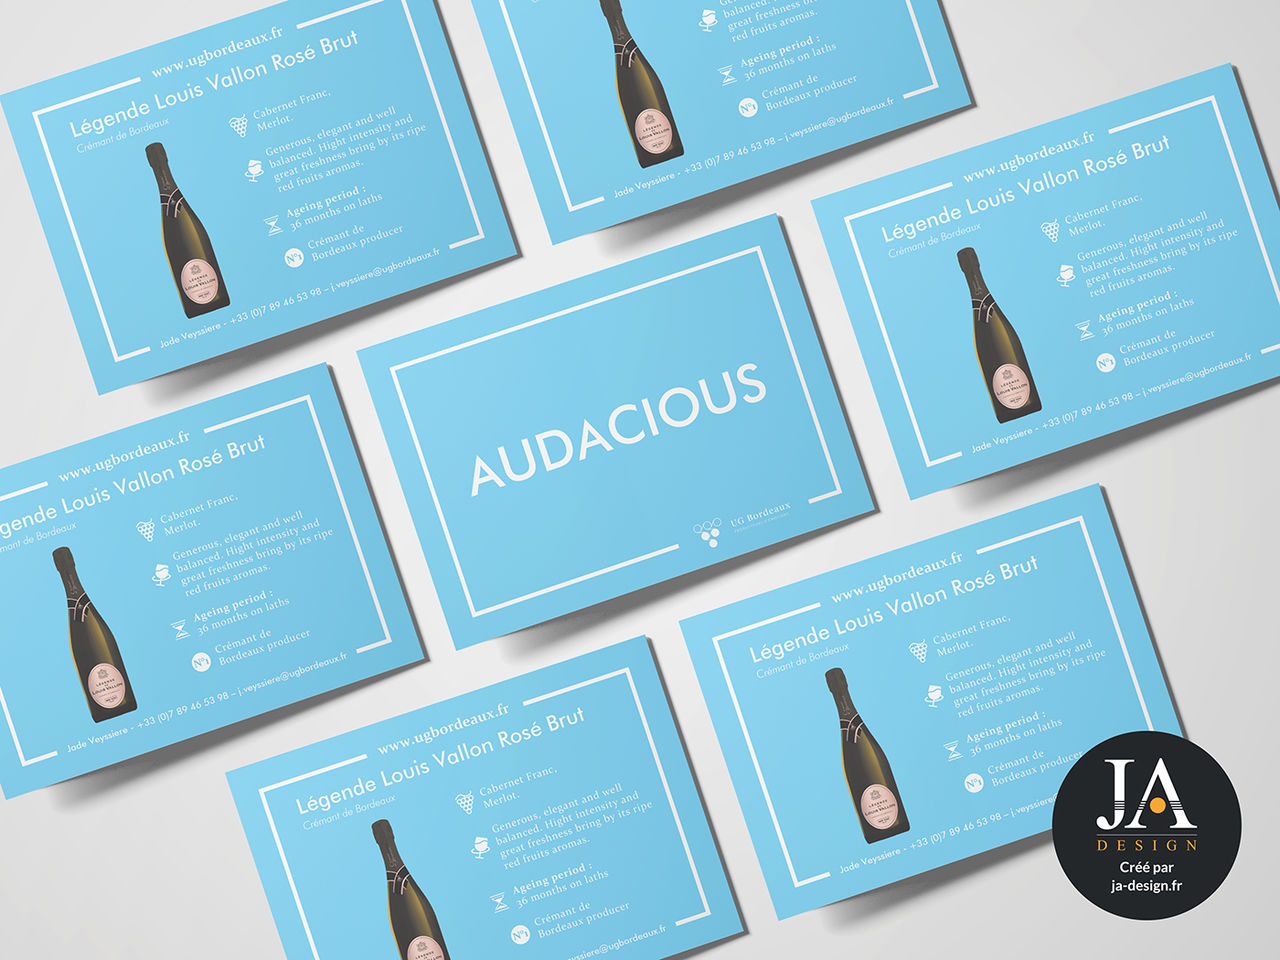 Carte postale UG Bordeaux